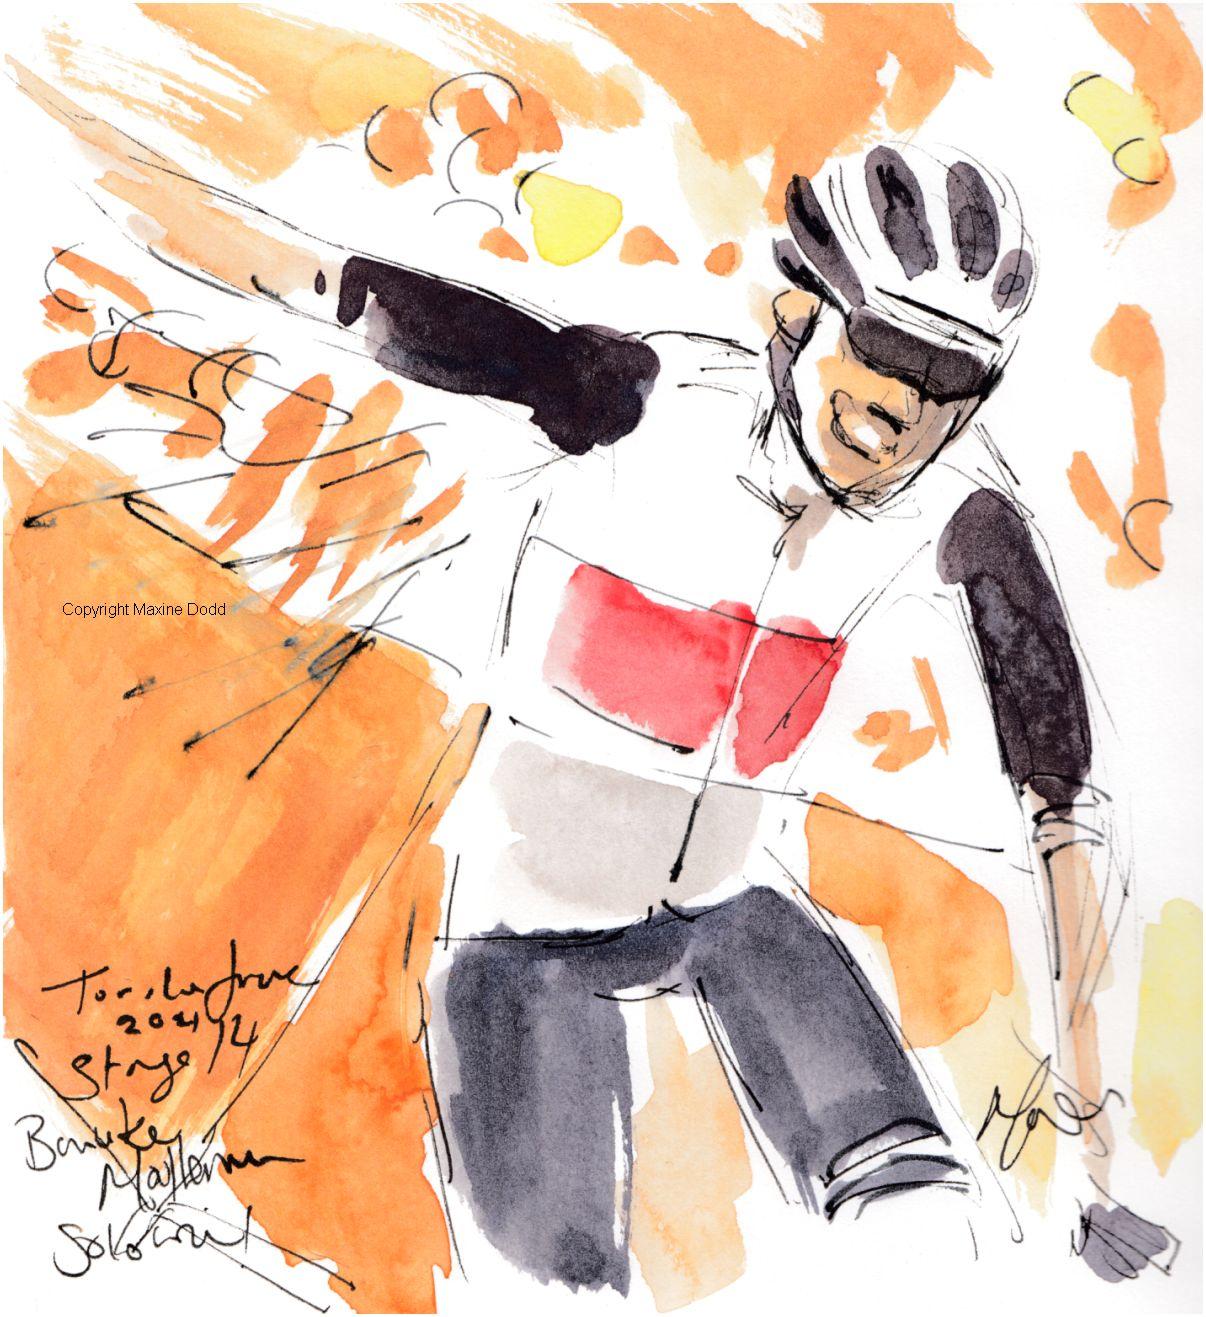 Tour de France 2021 - Stage14, Solo win! Bauke Mollema, original watercolour painting Maxine Dodd